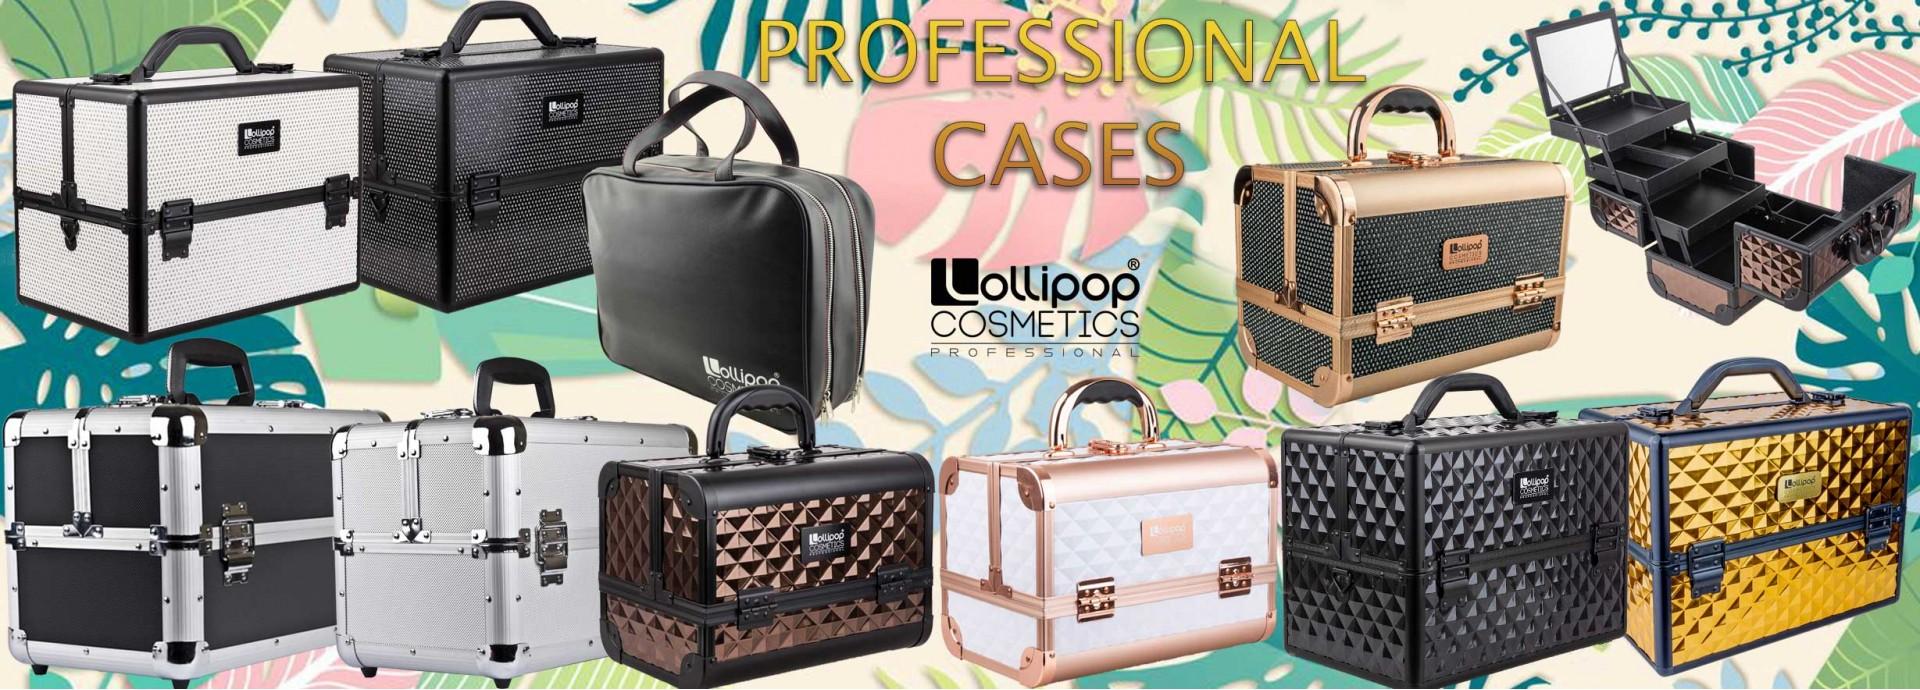 куфари, куфар, куфарче за гриове, козметика, фризьорси куфар